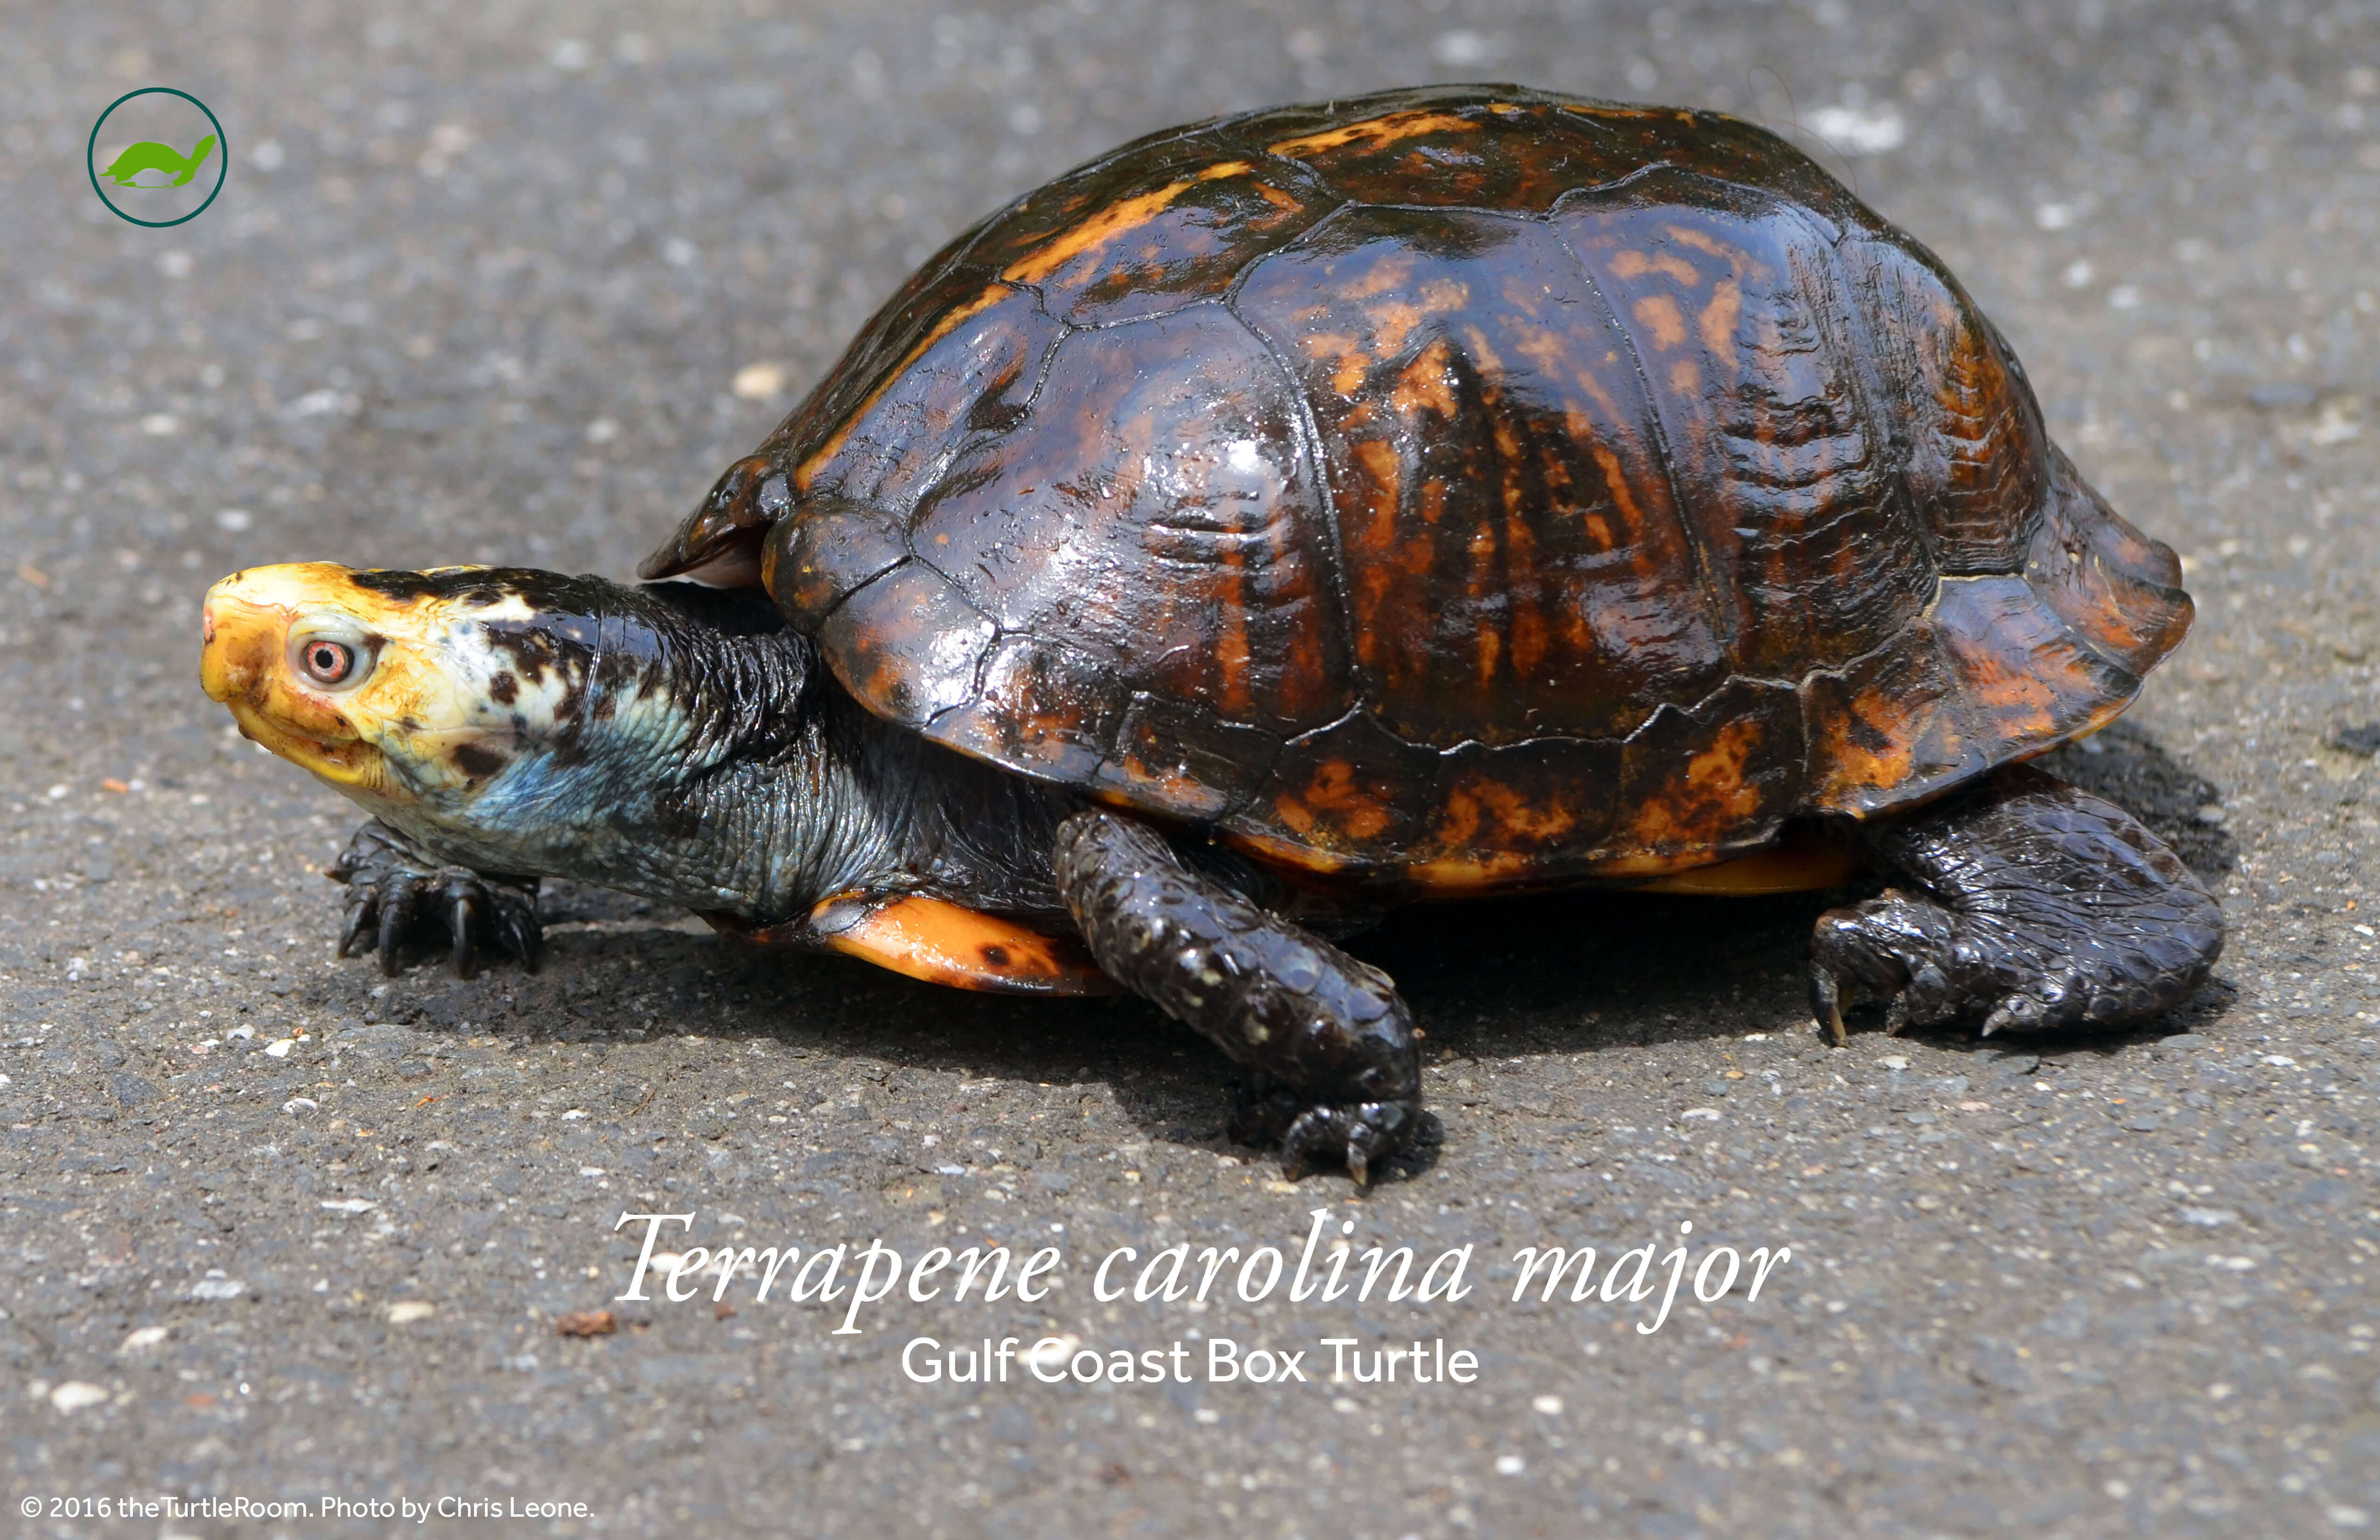 Terrapene carolina major (Gulf Coast Box Turtle) Poster